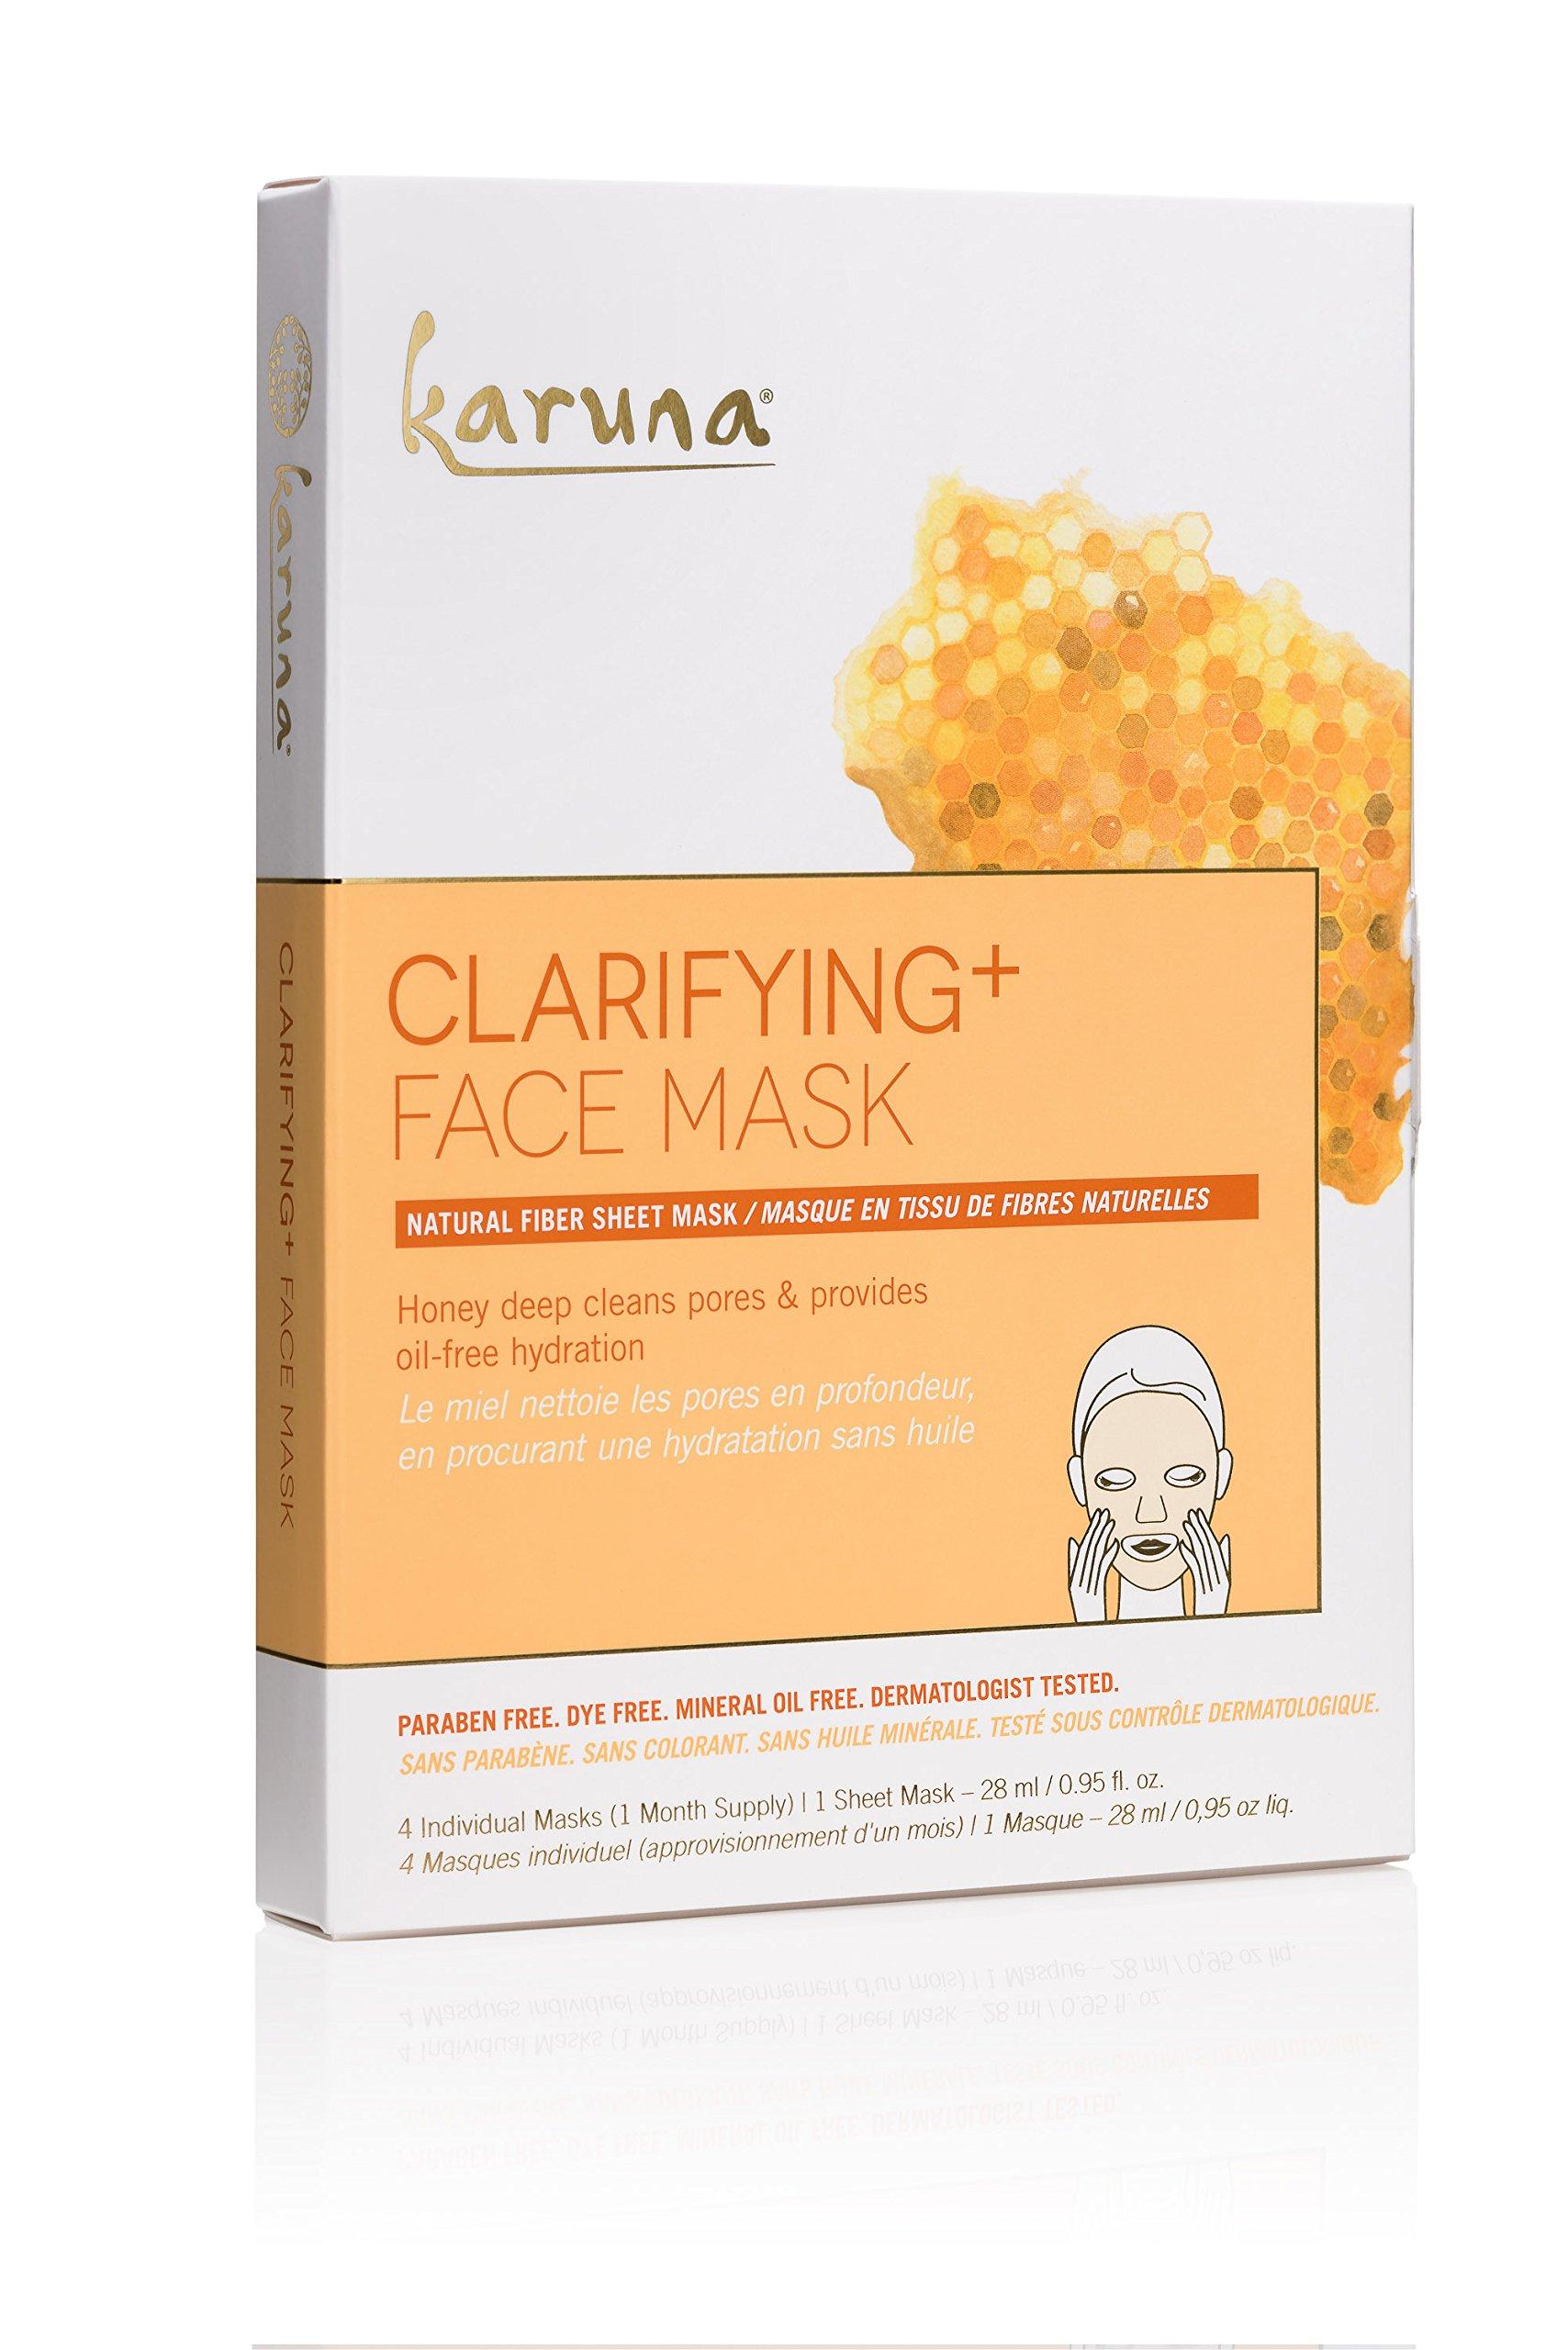 Karuna Clarifying + Face Mask